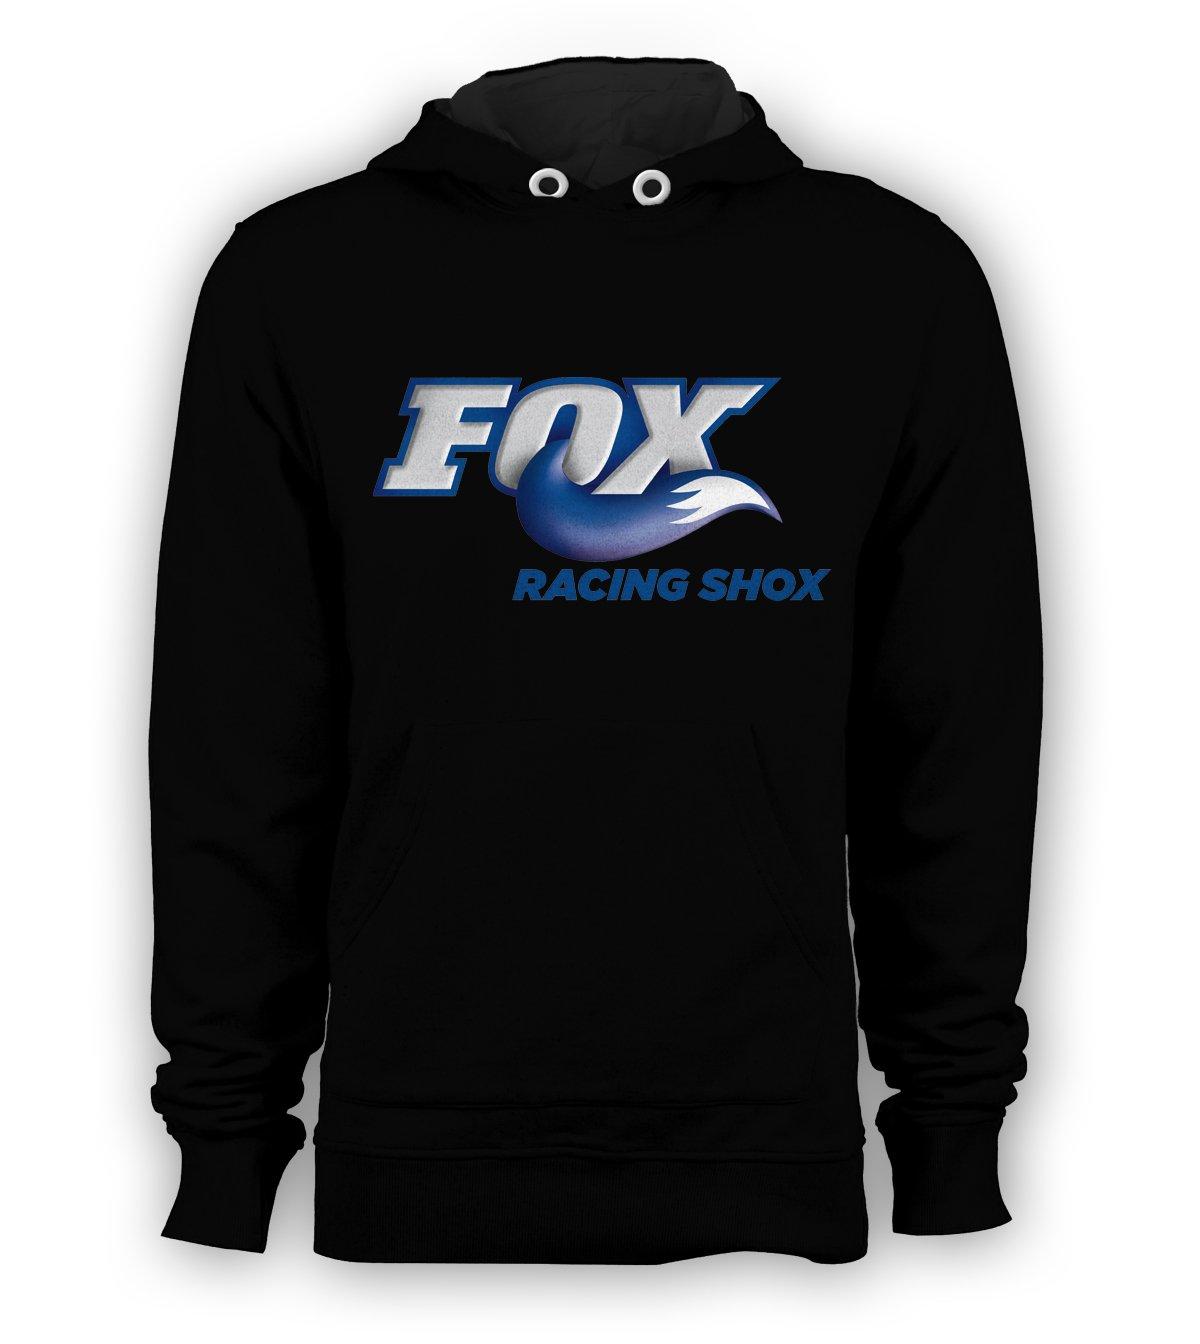 Fox Racing Shox Pullover Hoodie Men BMX Skateboard X-Games Sweatshirts Size S to 3XL New Black